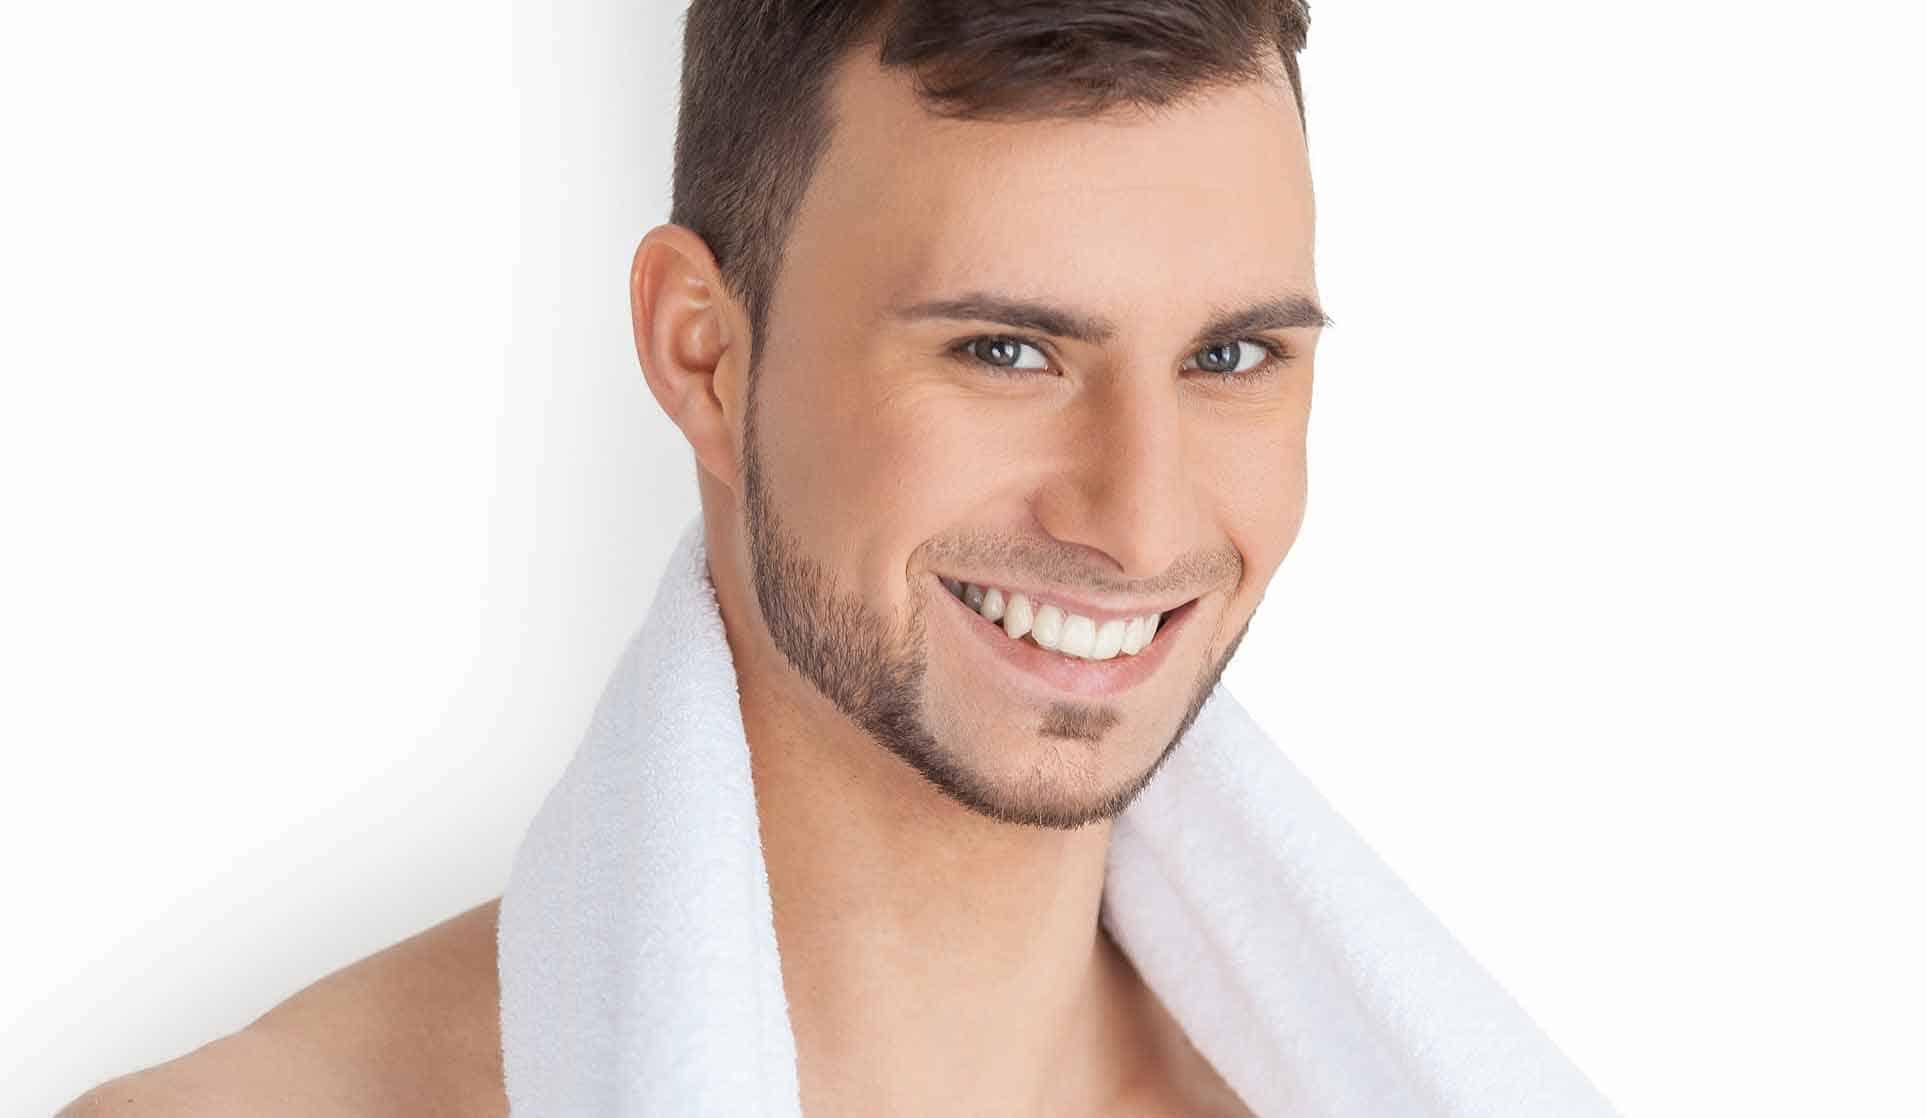 Surprising Wear It With Pride The Absolute Best Beard Styles Of 2016 Short Hairstyles Gunalazisus